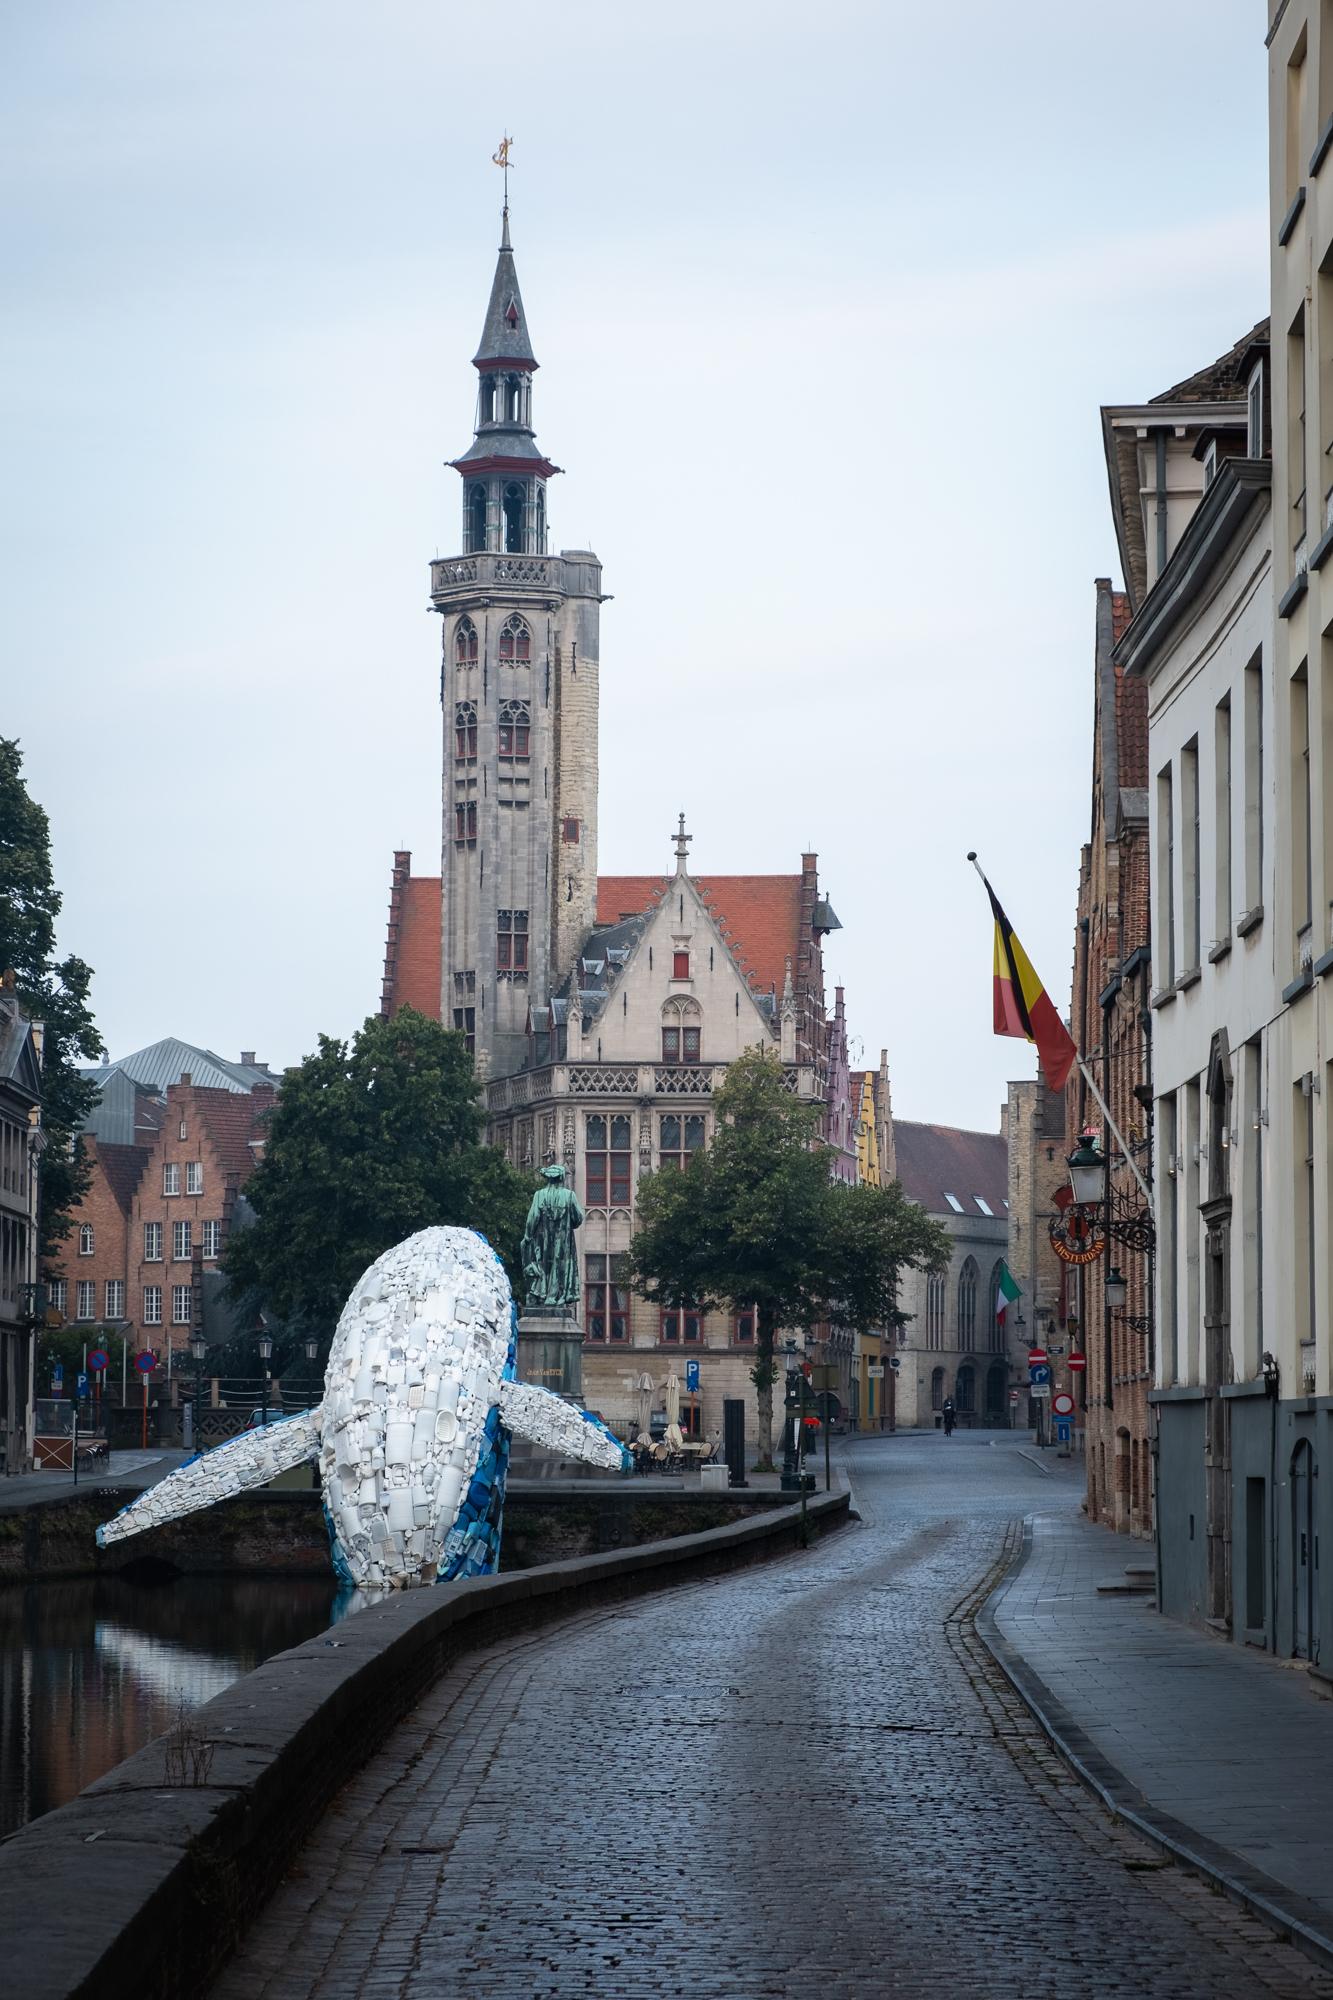 180722 - Bruges - Sunrise - Poortersloge 001.jpg